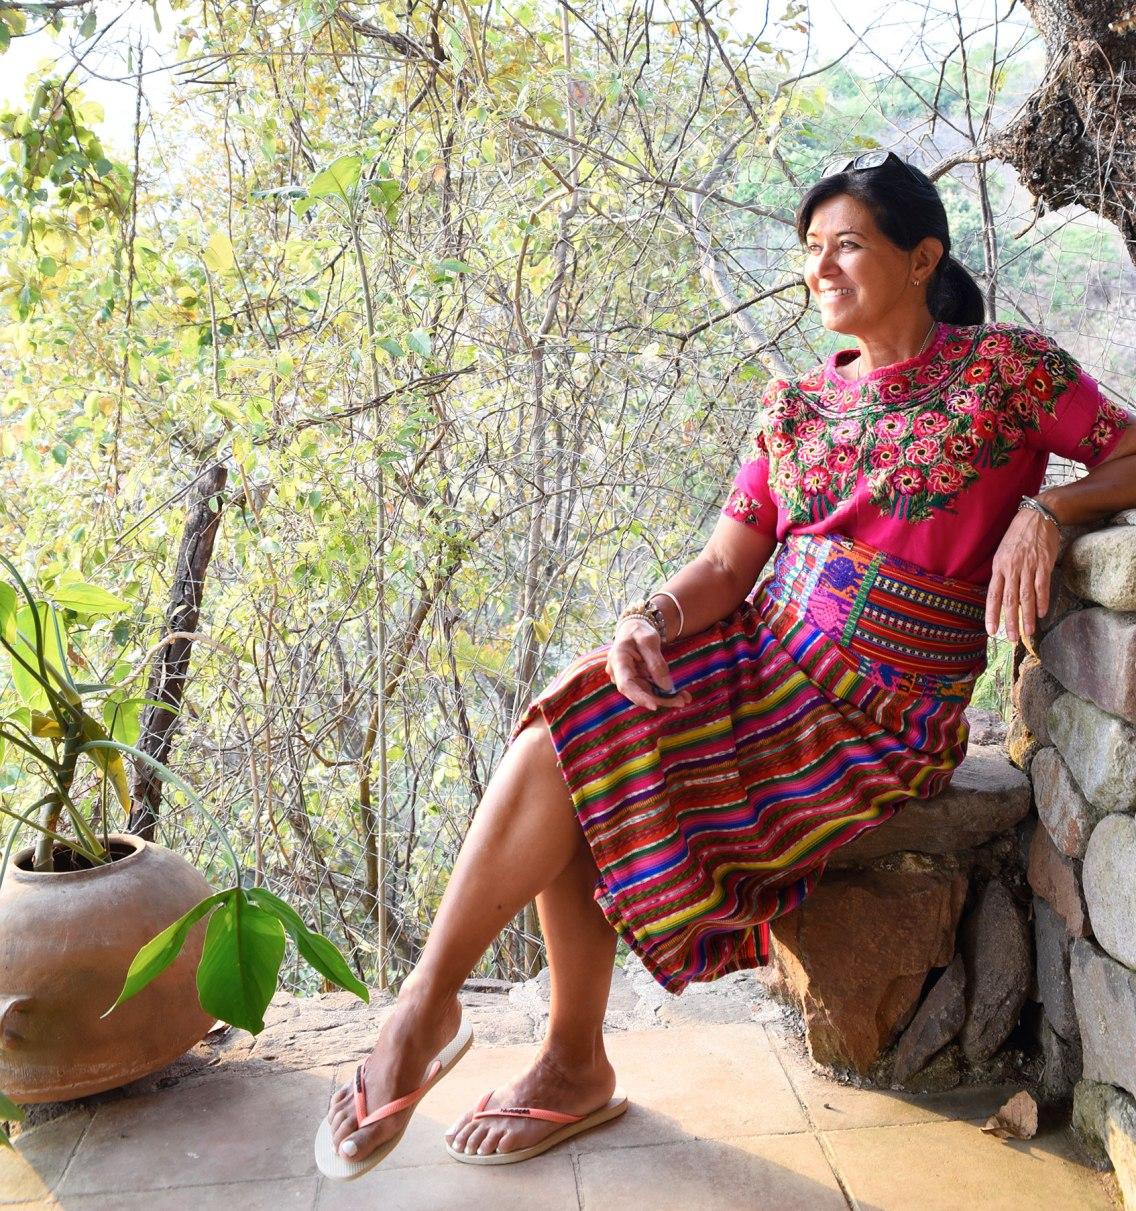 Anita in Guatemala